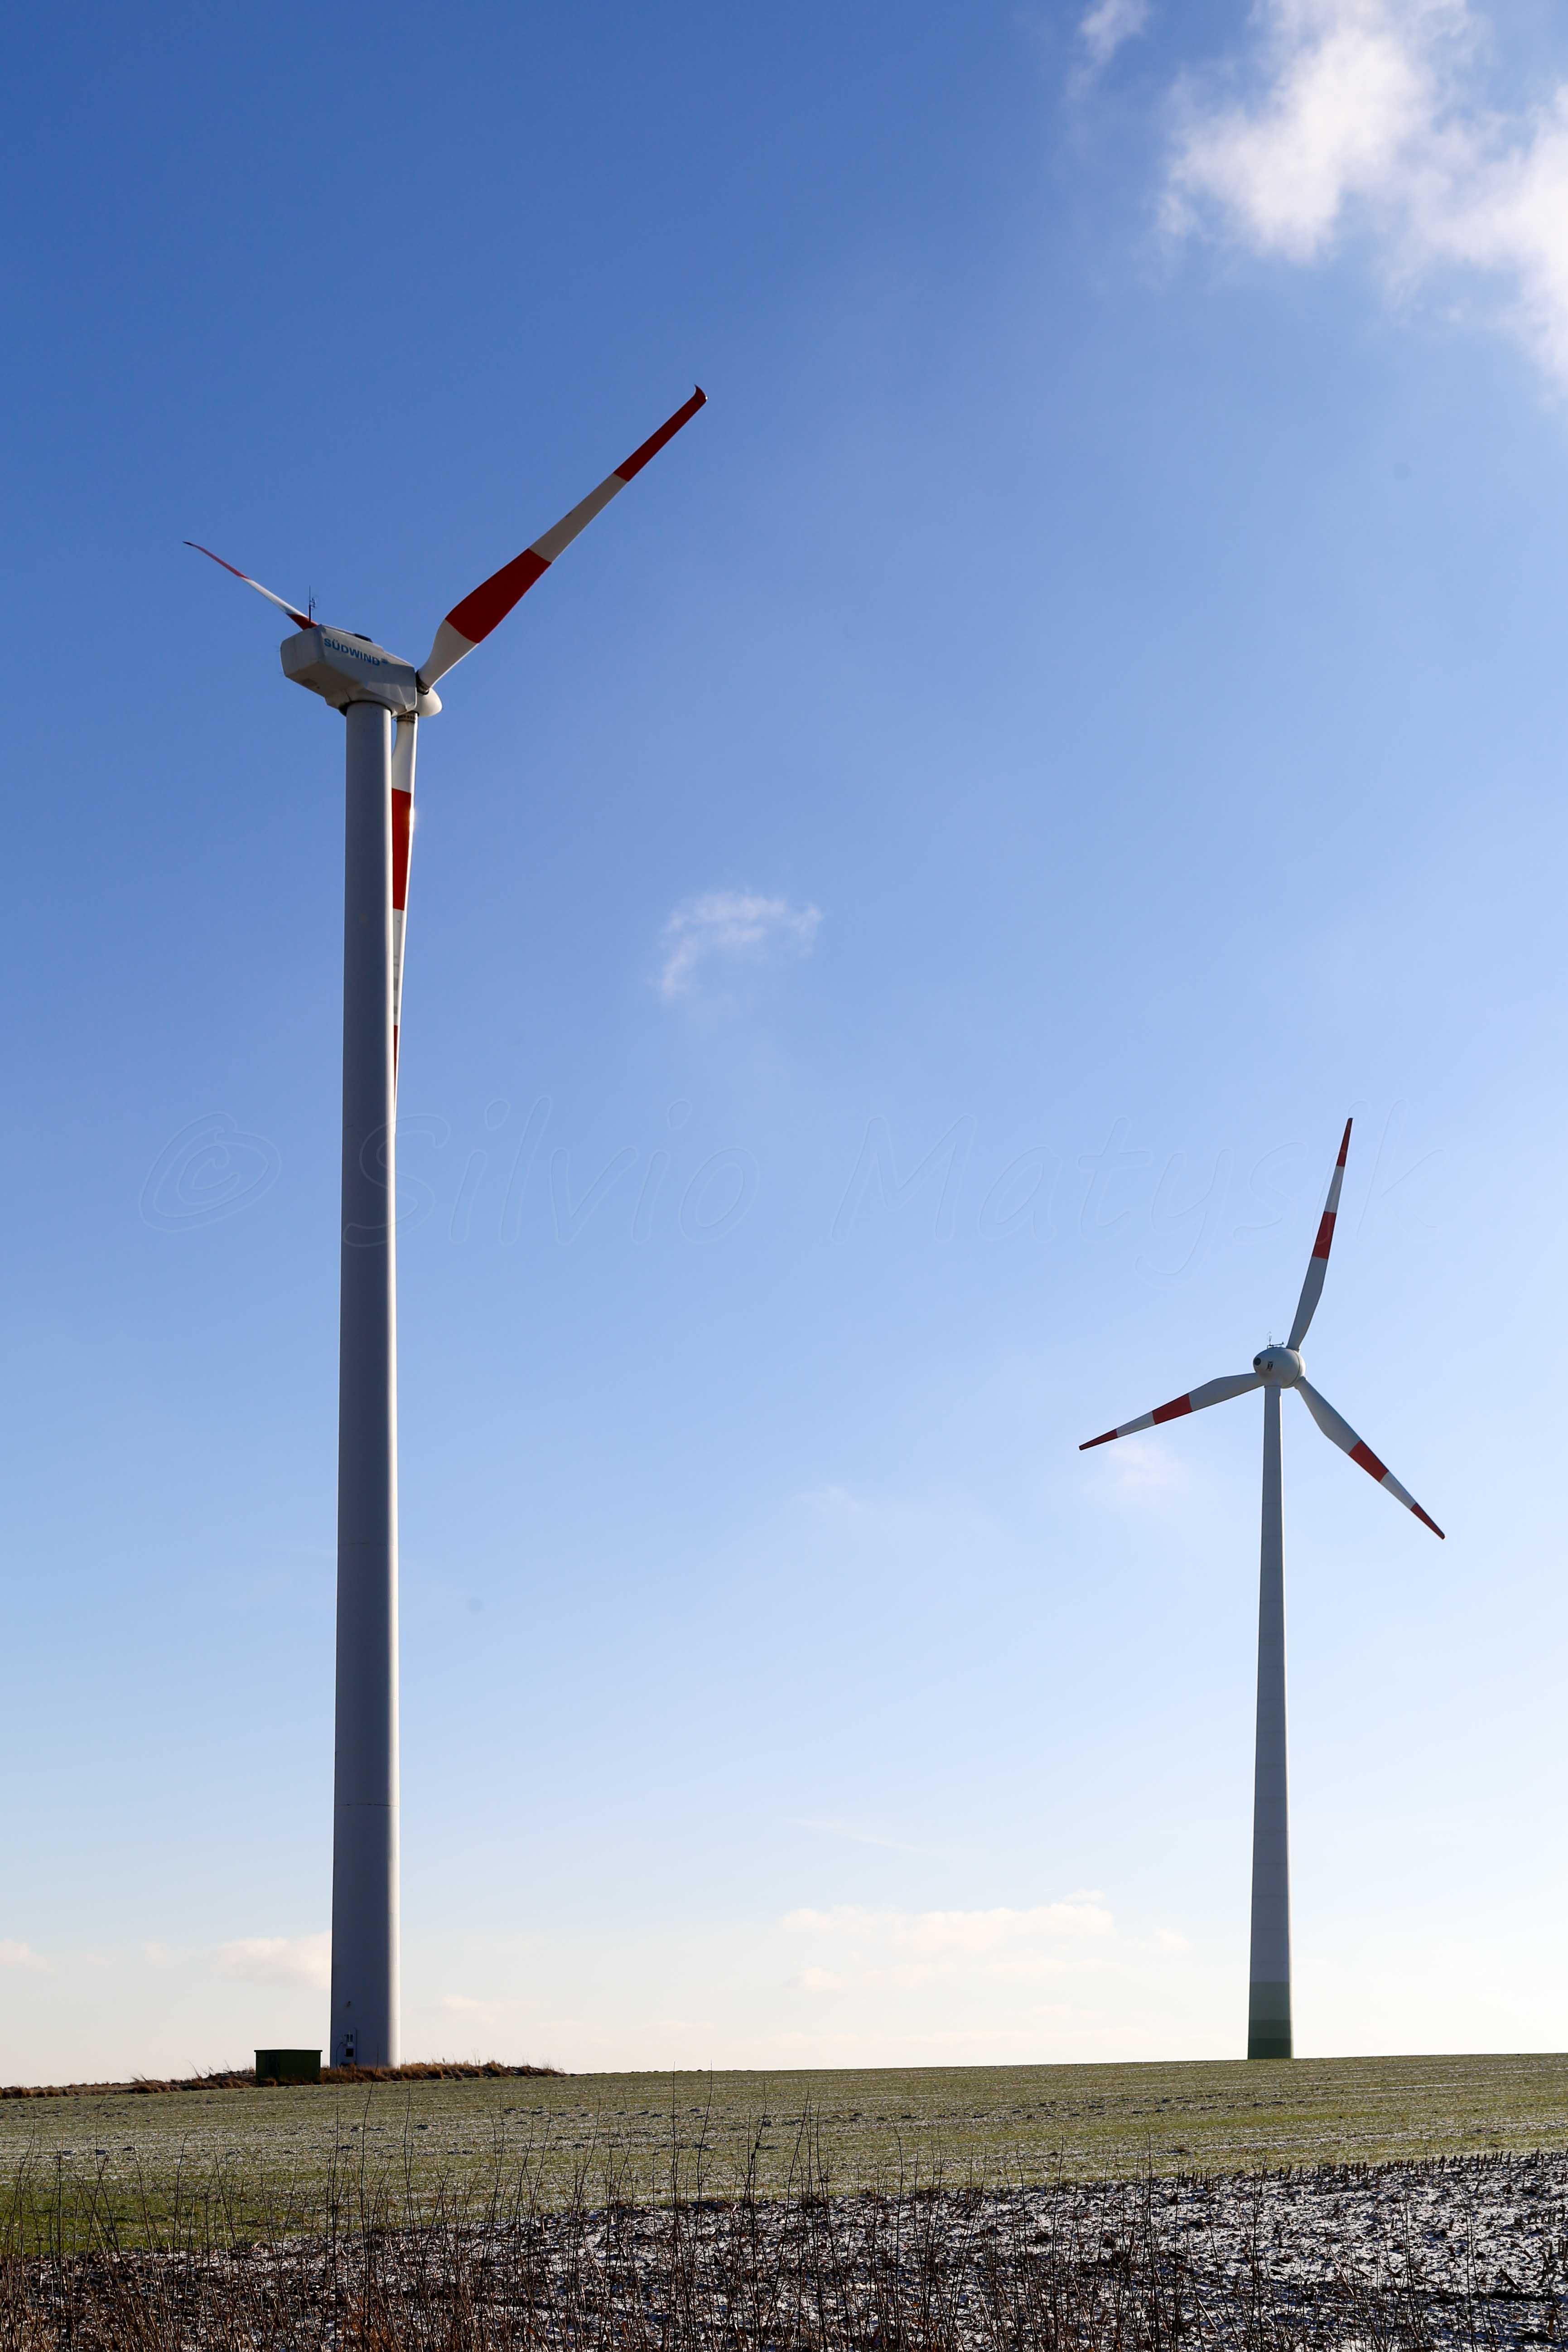 Südwind S-46 - 600,00 kW - Windkraftanlage